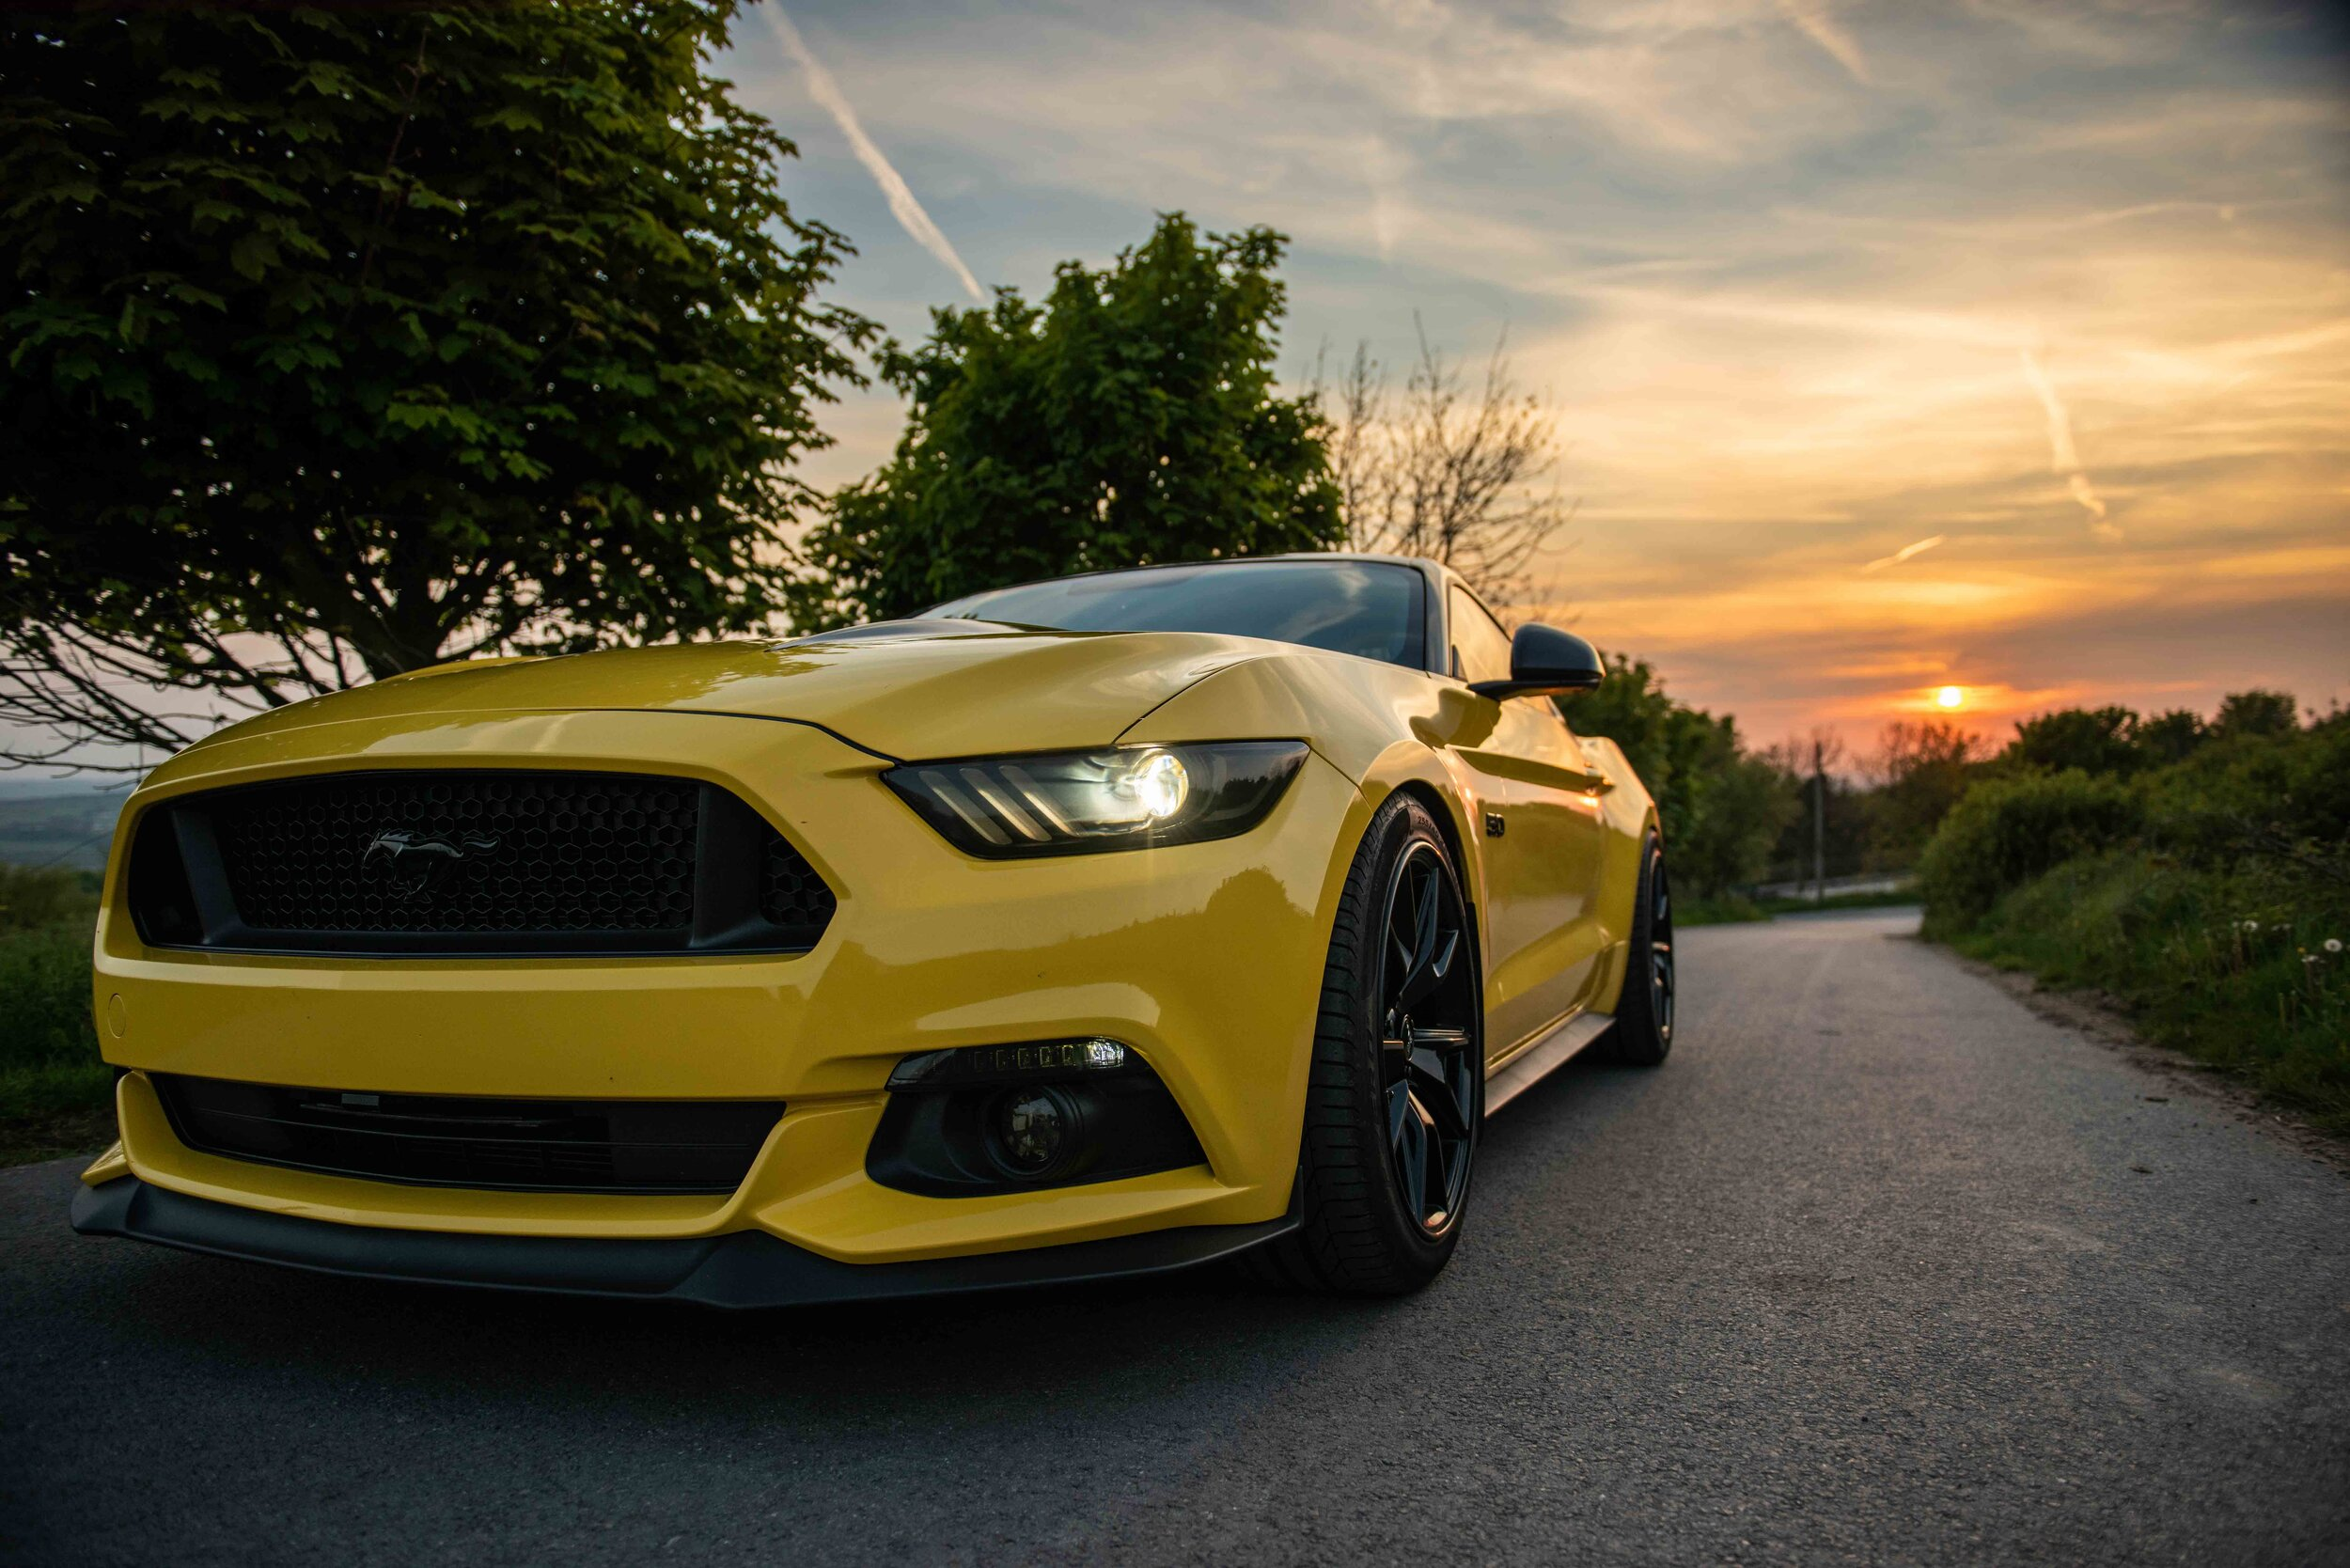 Mustang-24.jpg